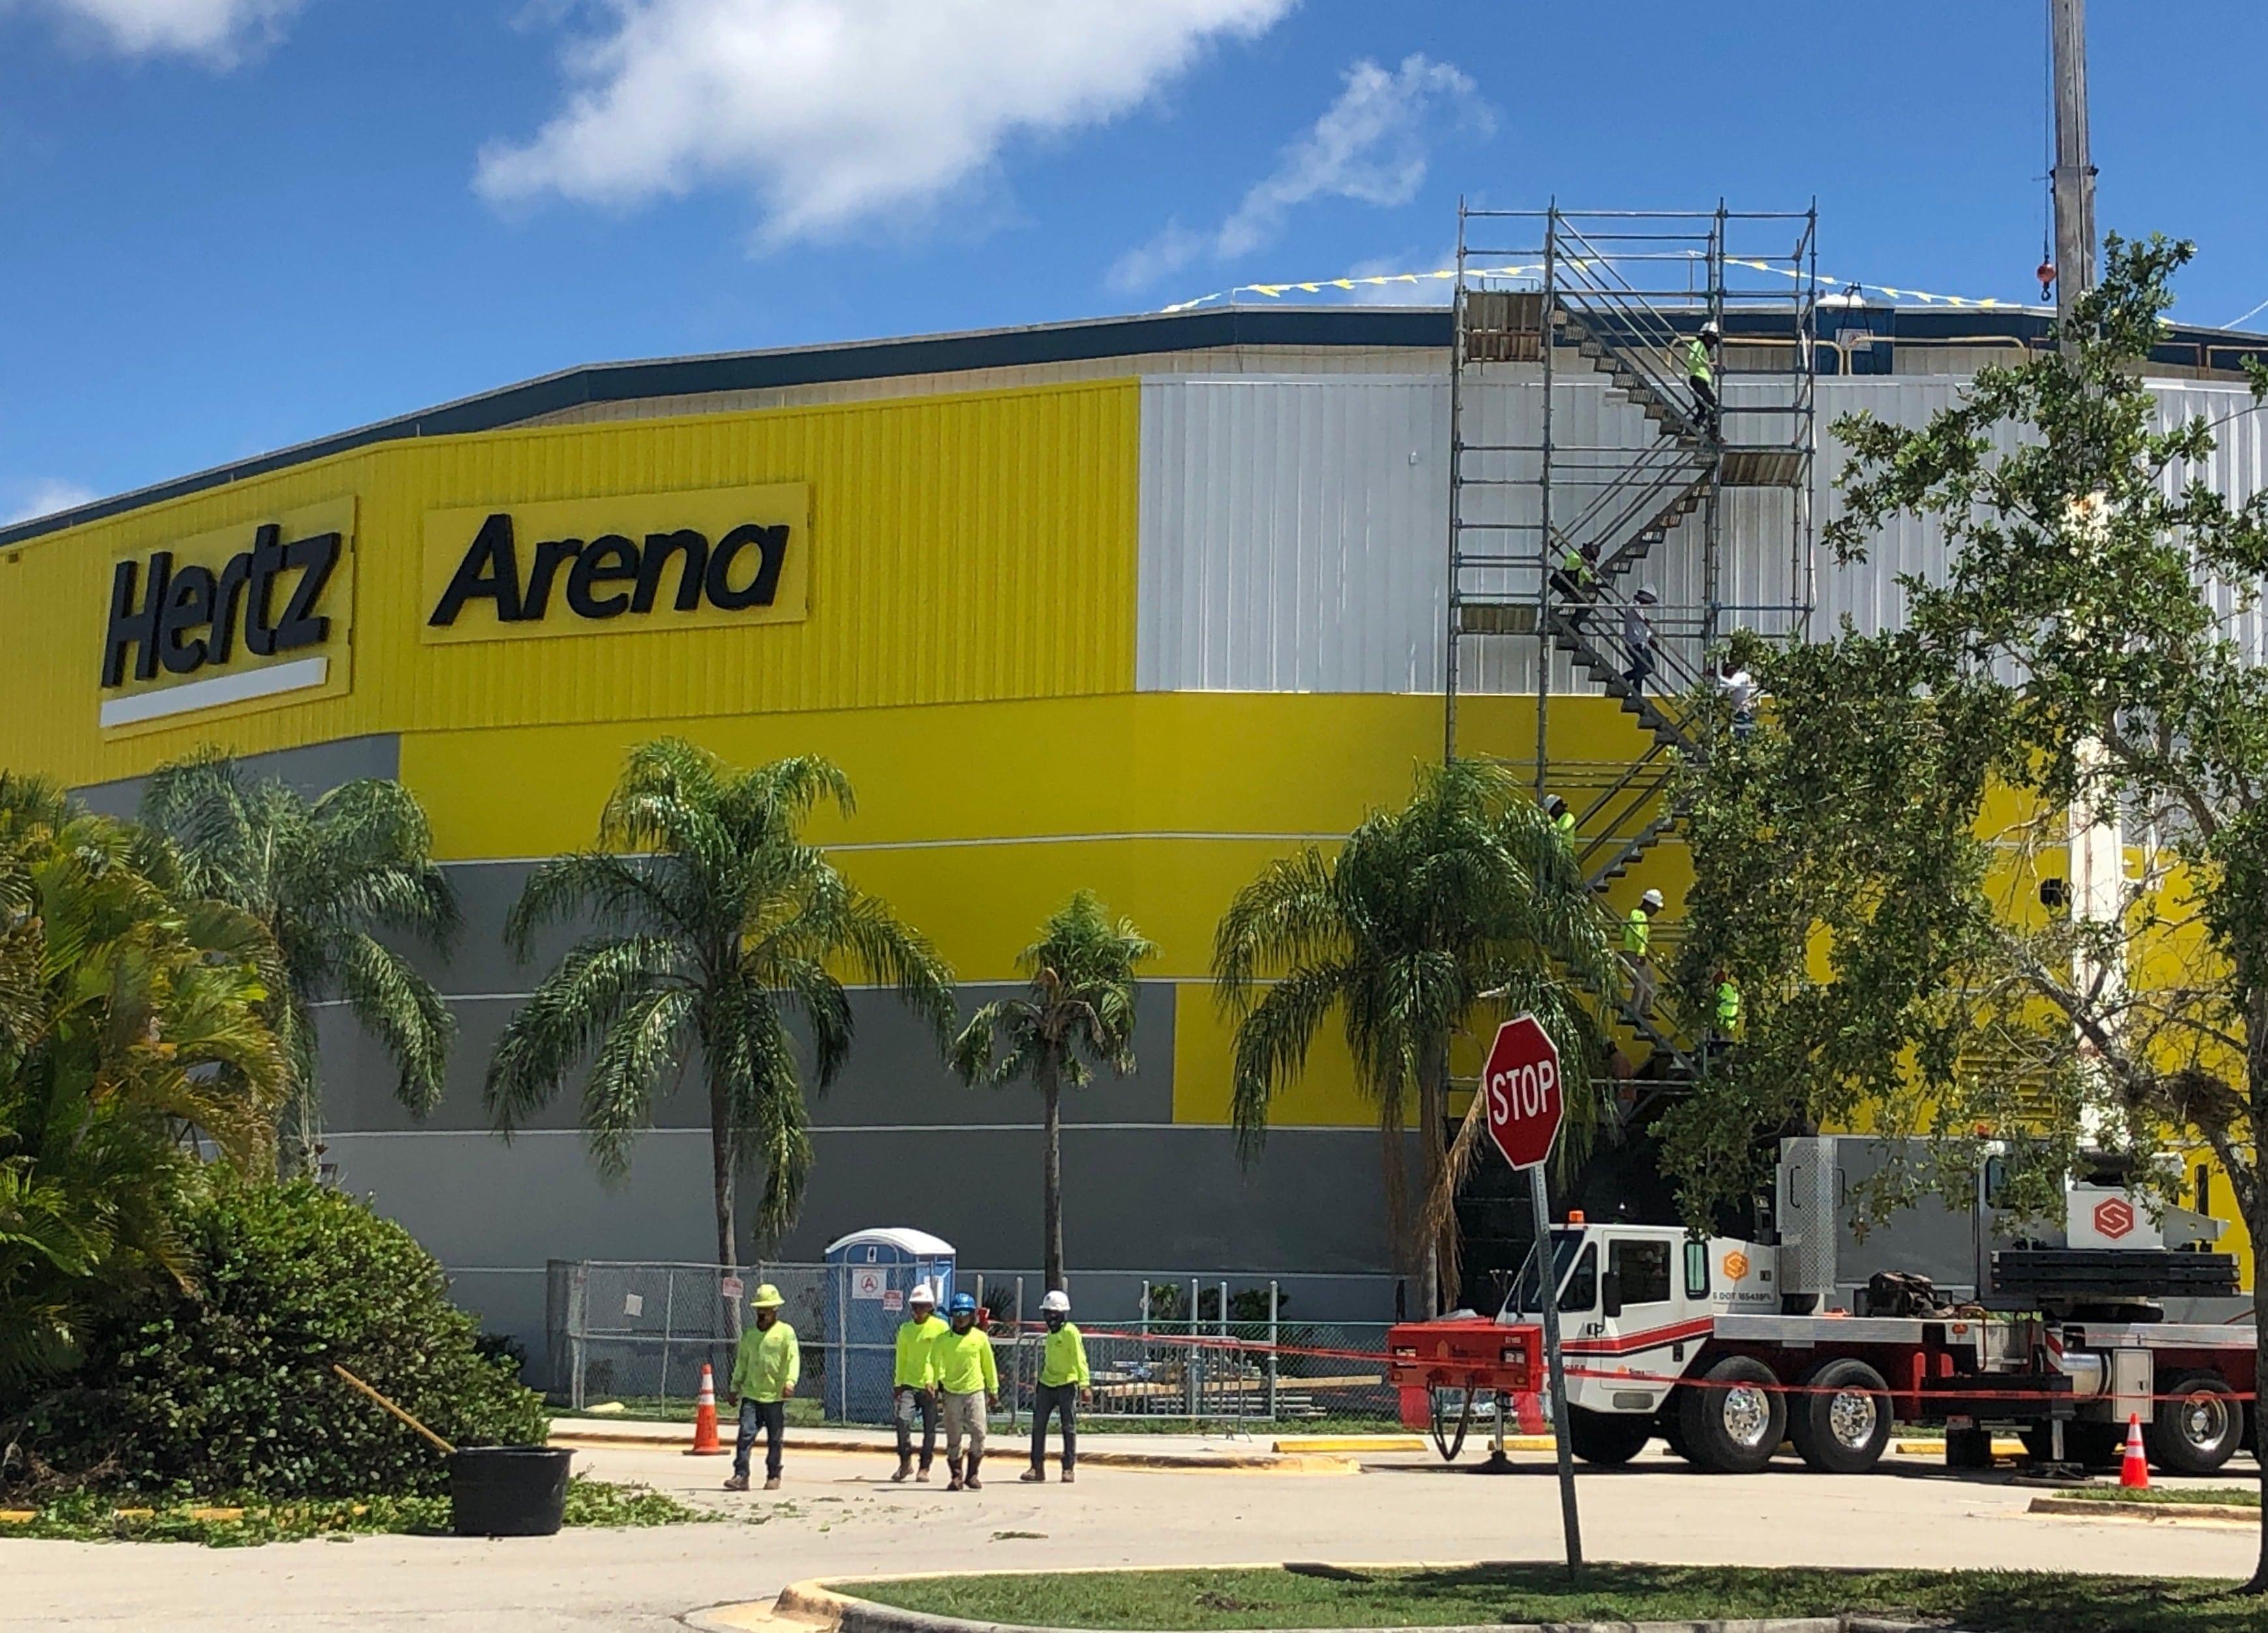 Scaffolding at Hertz Arena